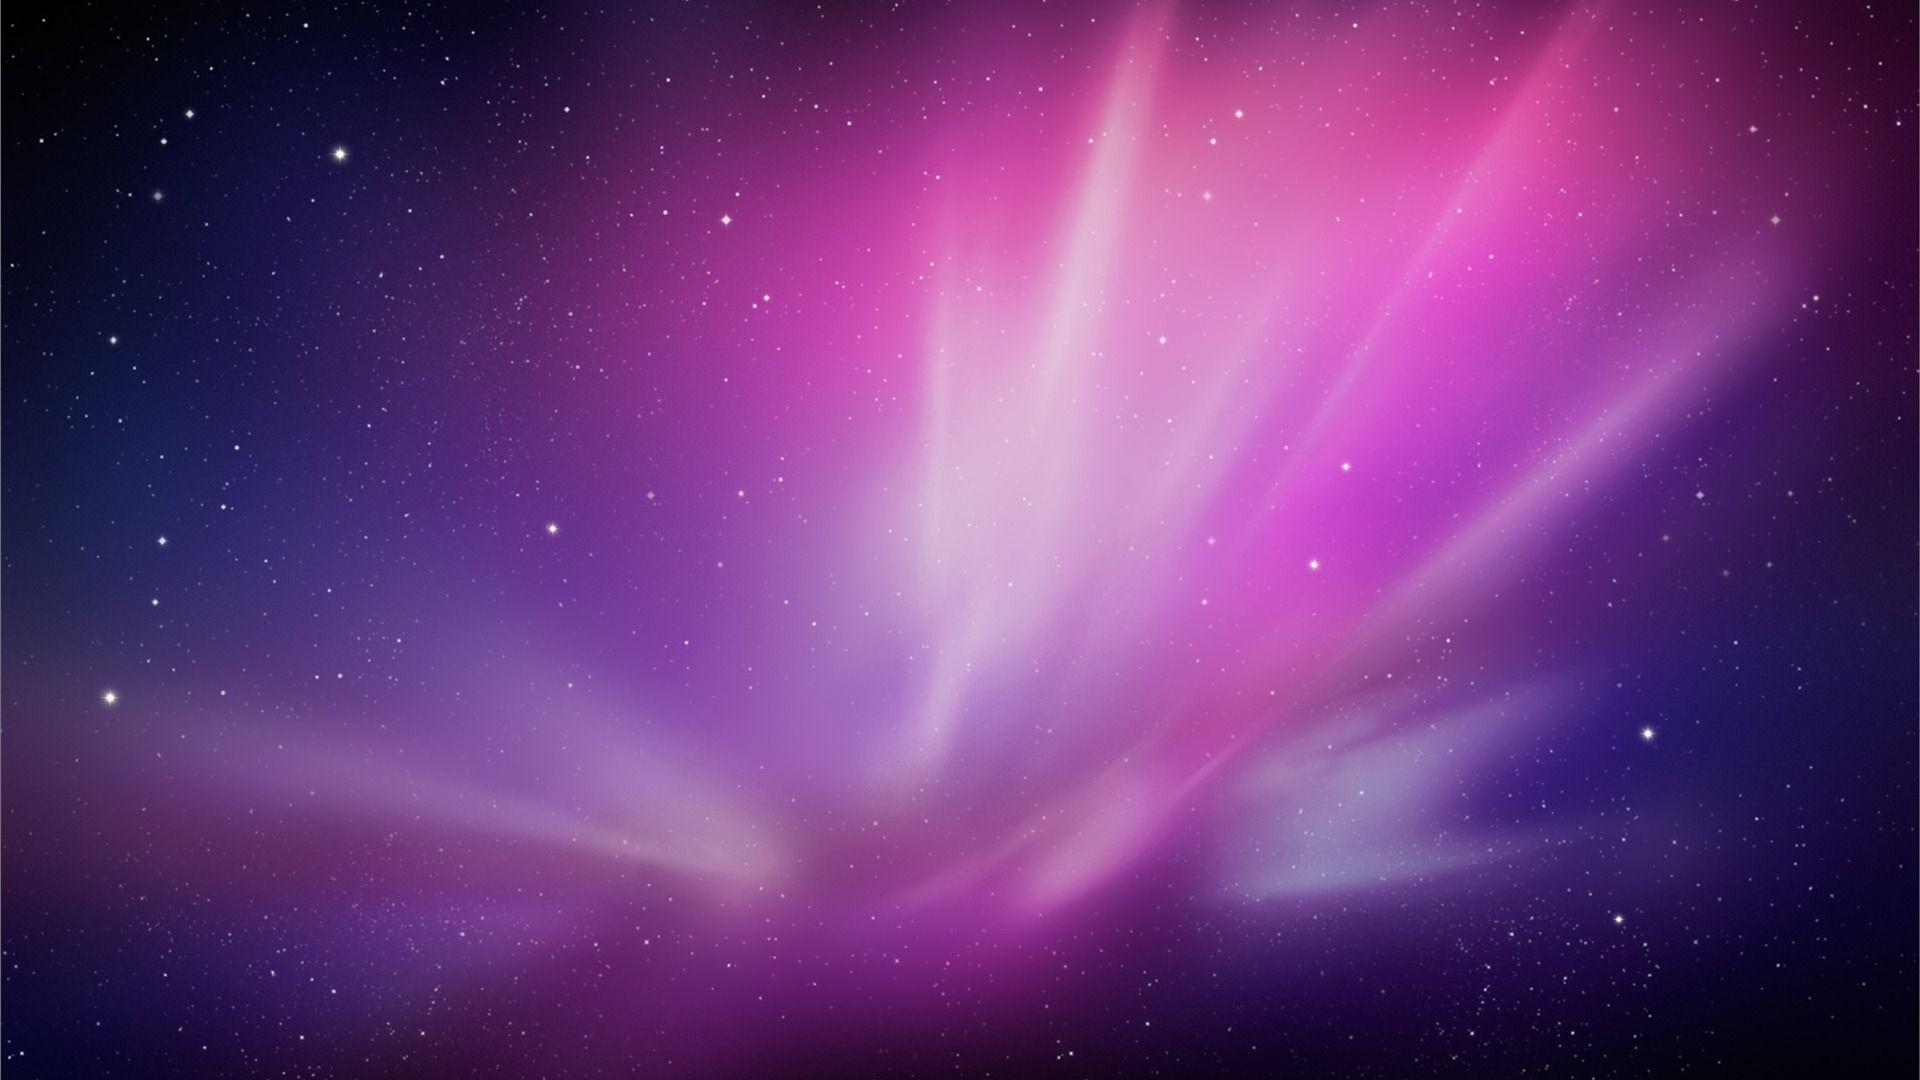 wallpapers widescreen 1920x1080 galaxy - photo #32